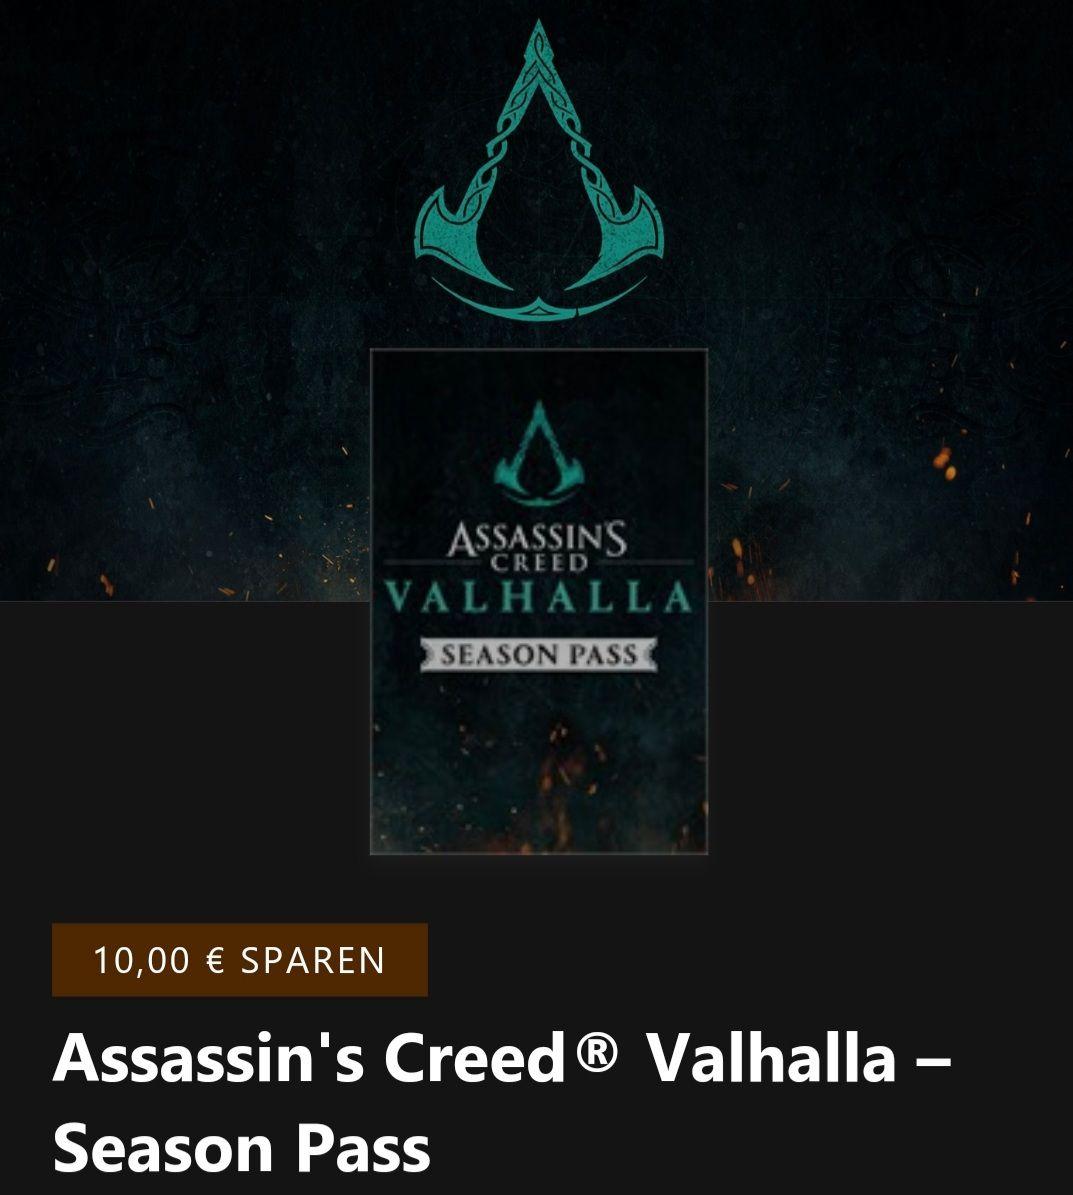 Assassins Creed Valhalla Season Pass (Xbox Series S/X)